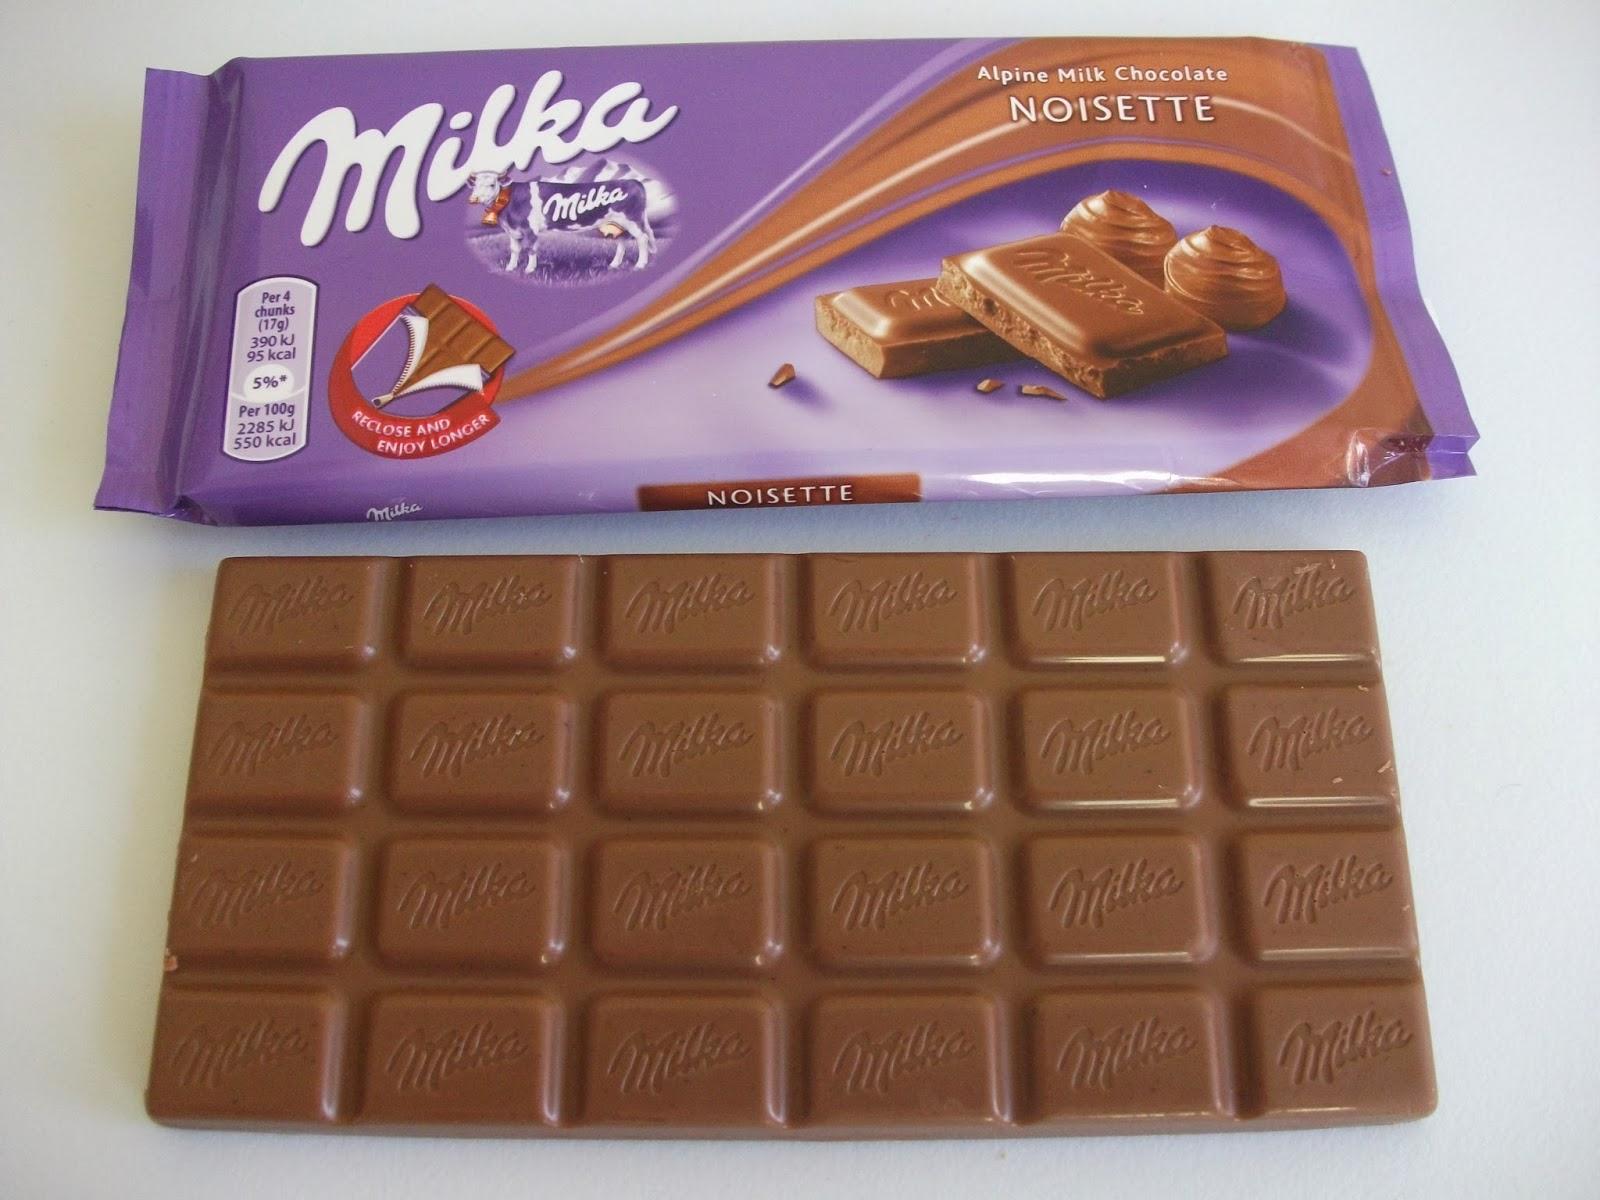 Milka Noisette Alpine Milk Chocolate Review